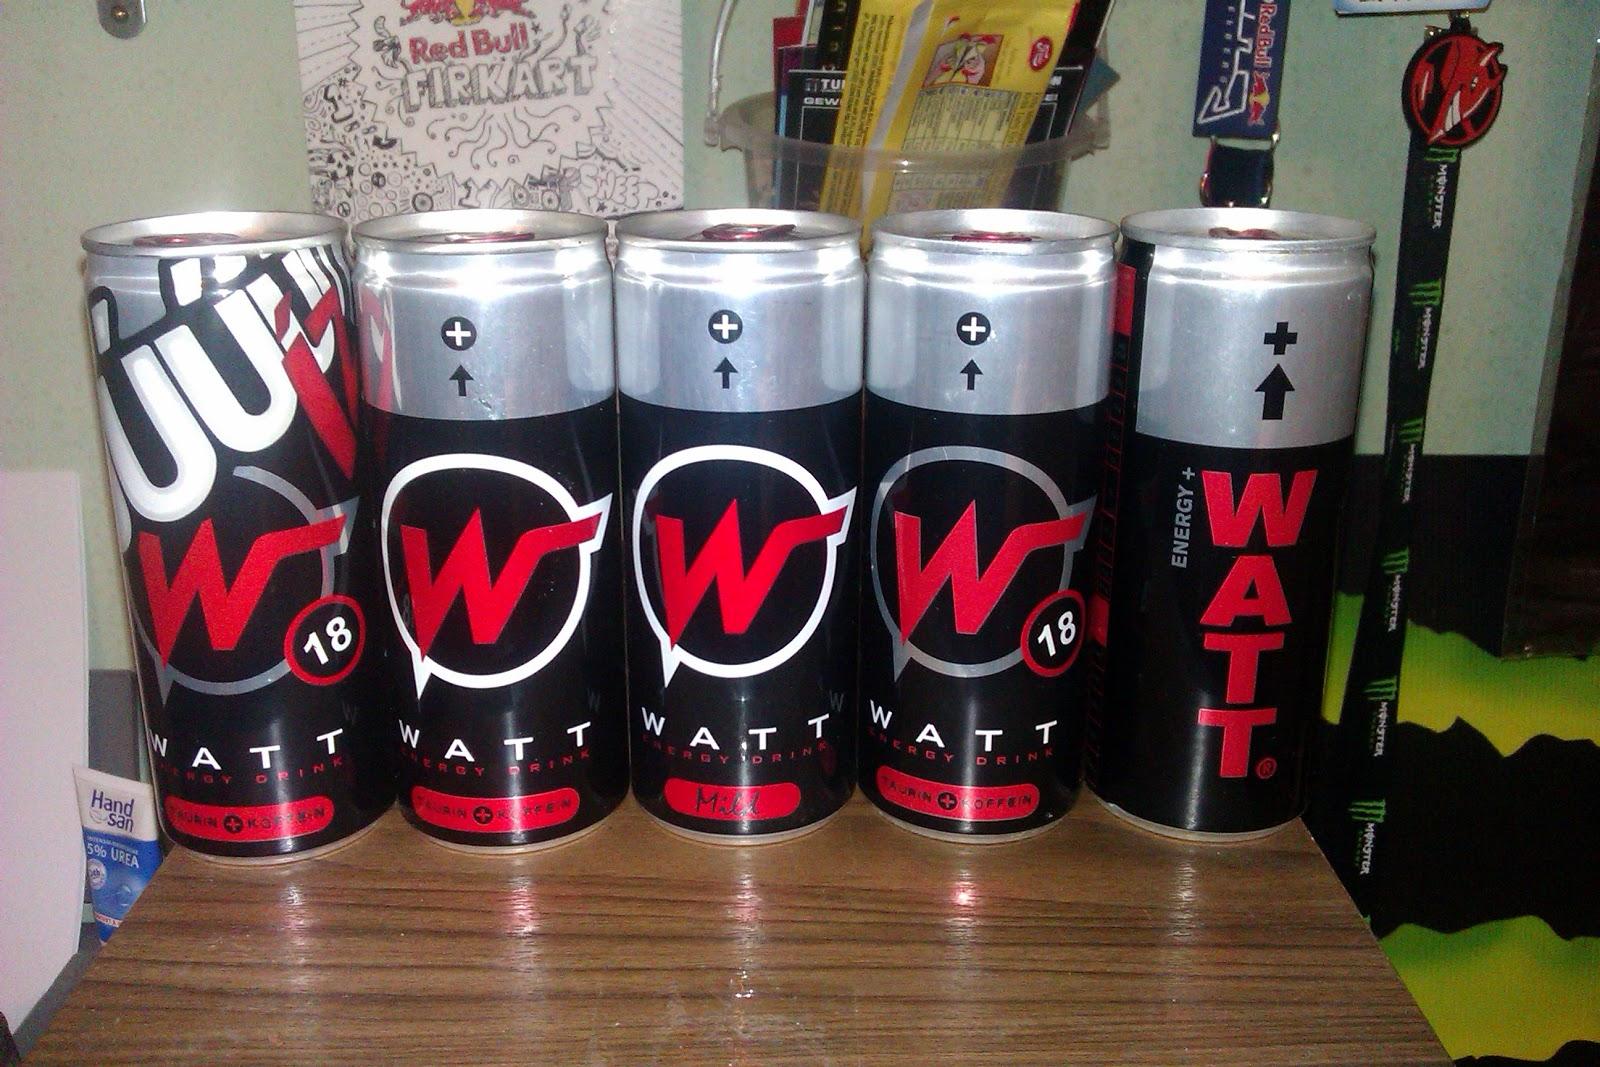 Watt Energy Drink Hungary